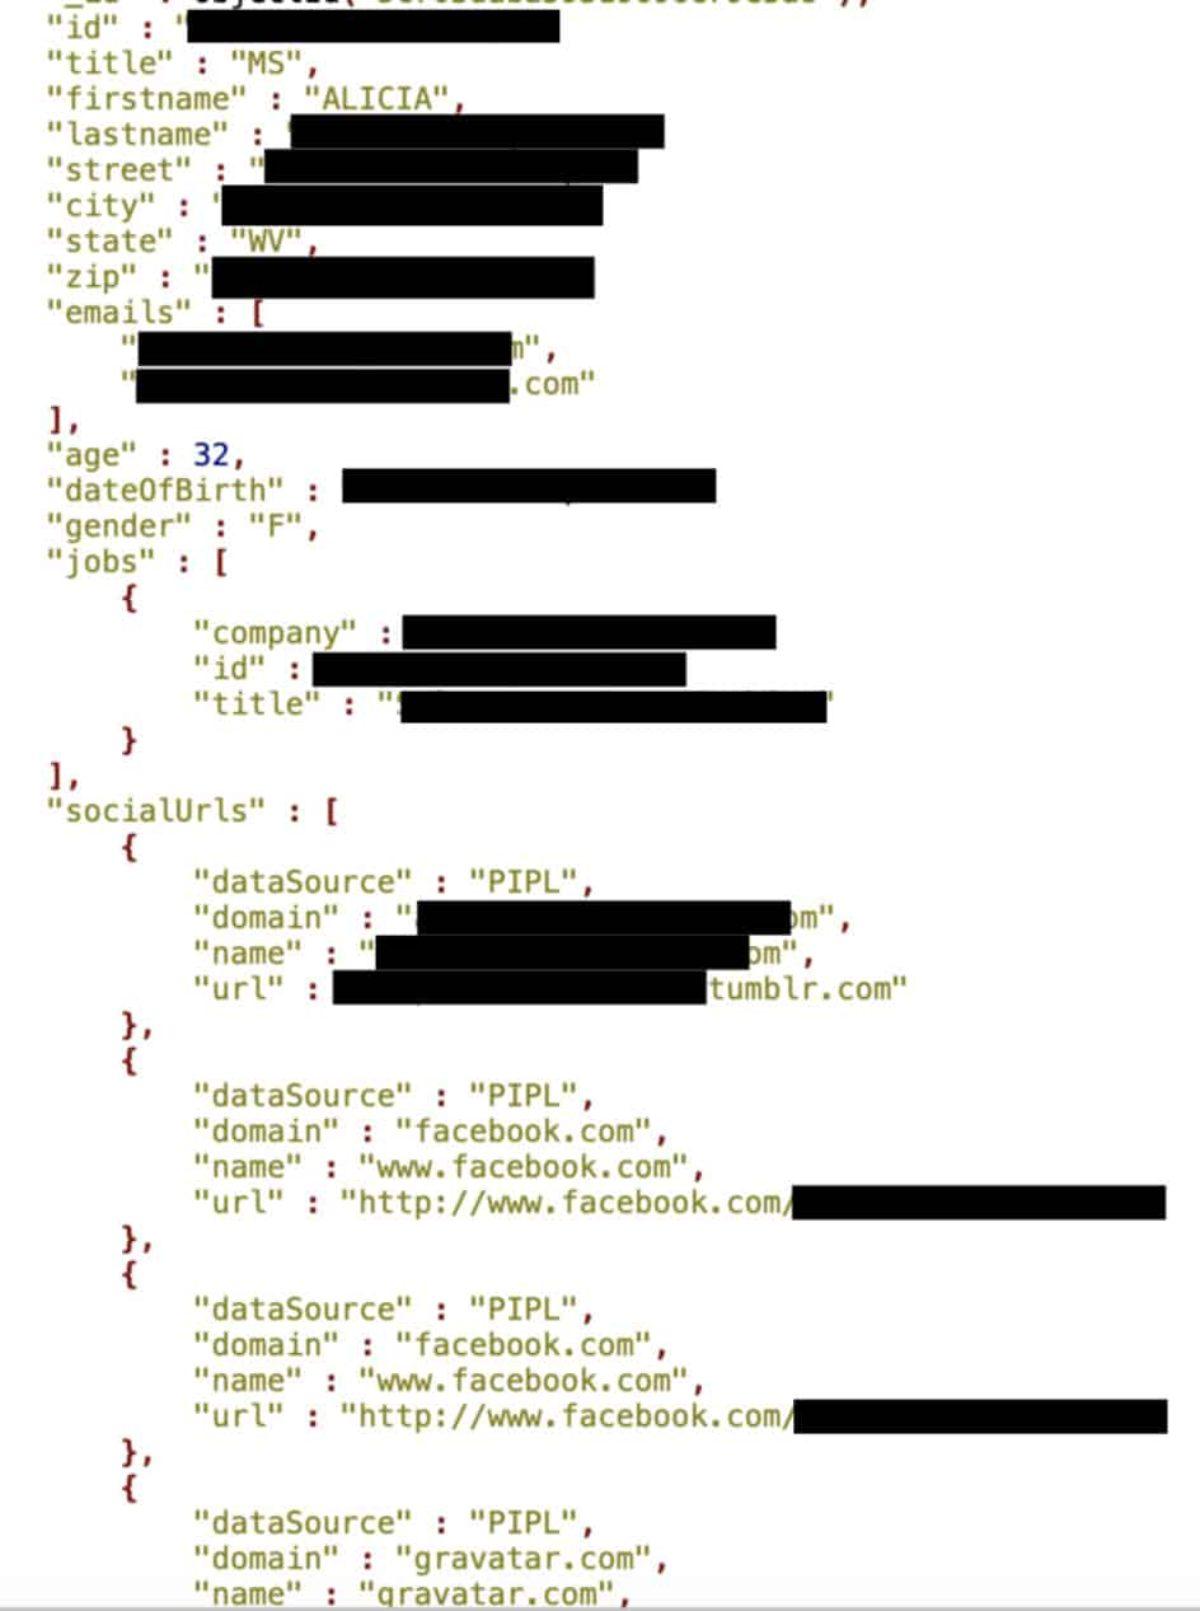 mongodb database records